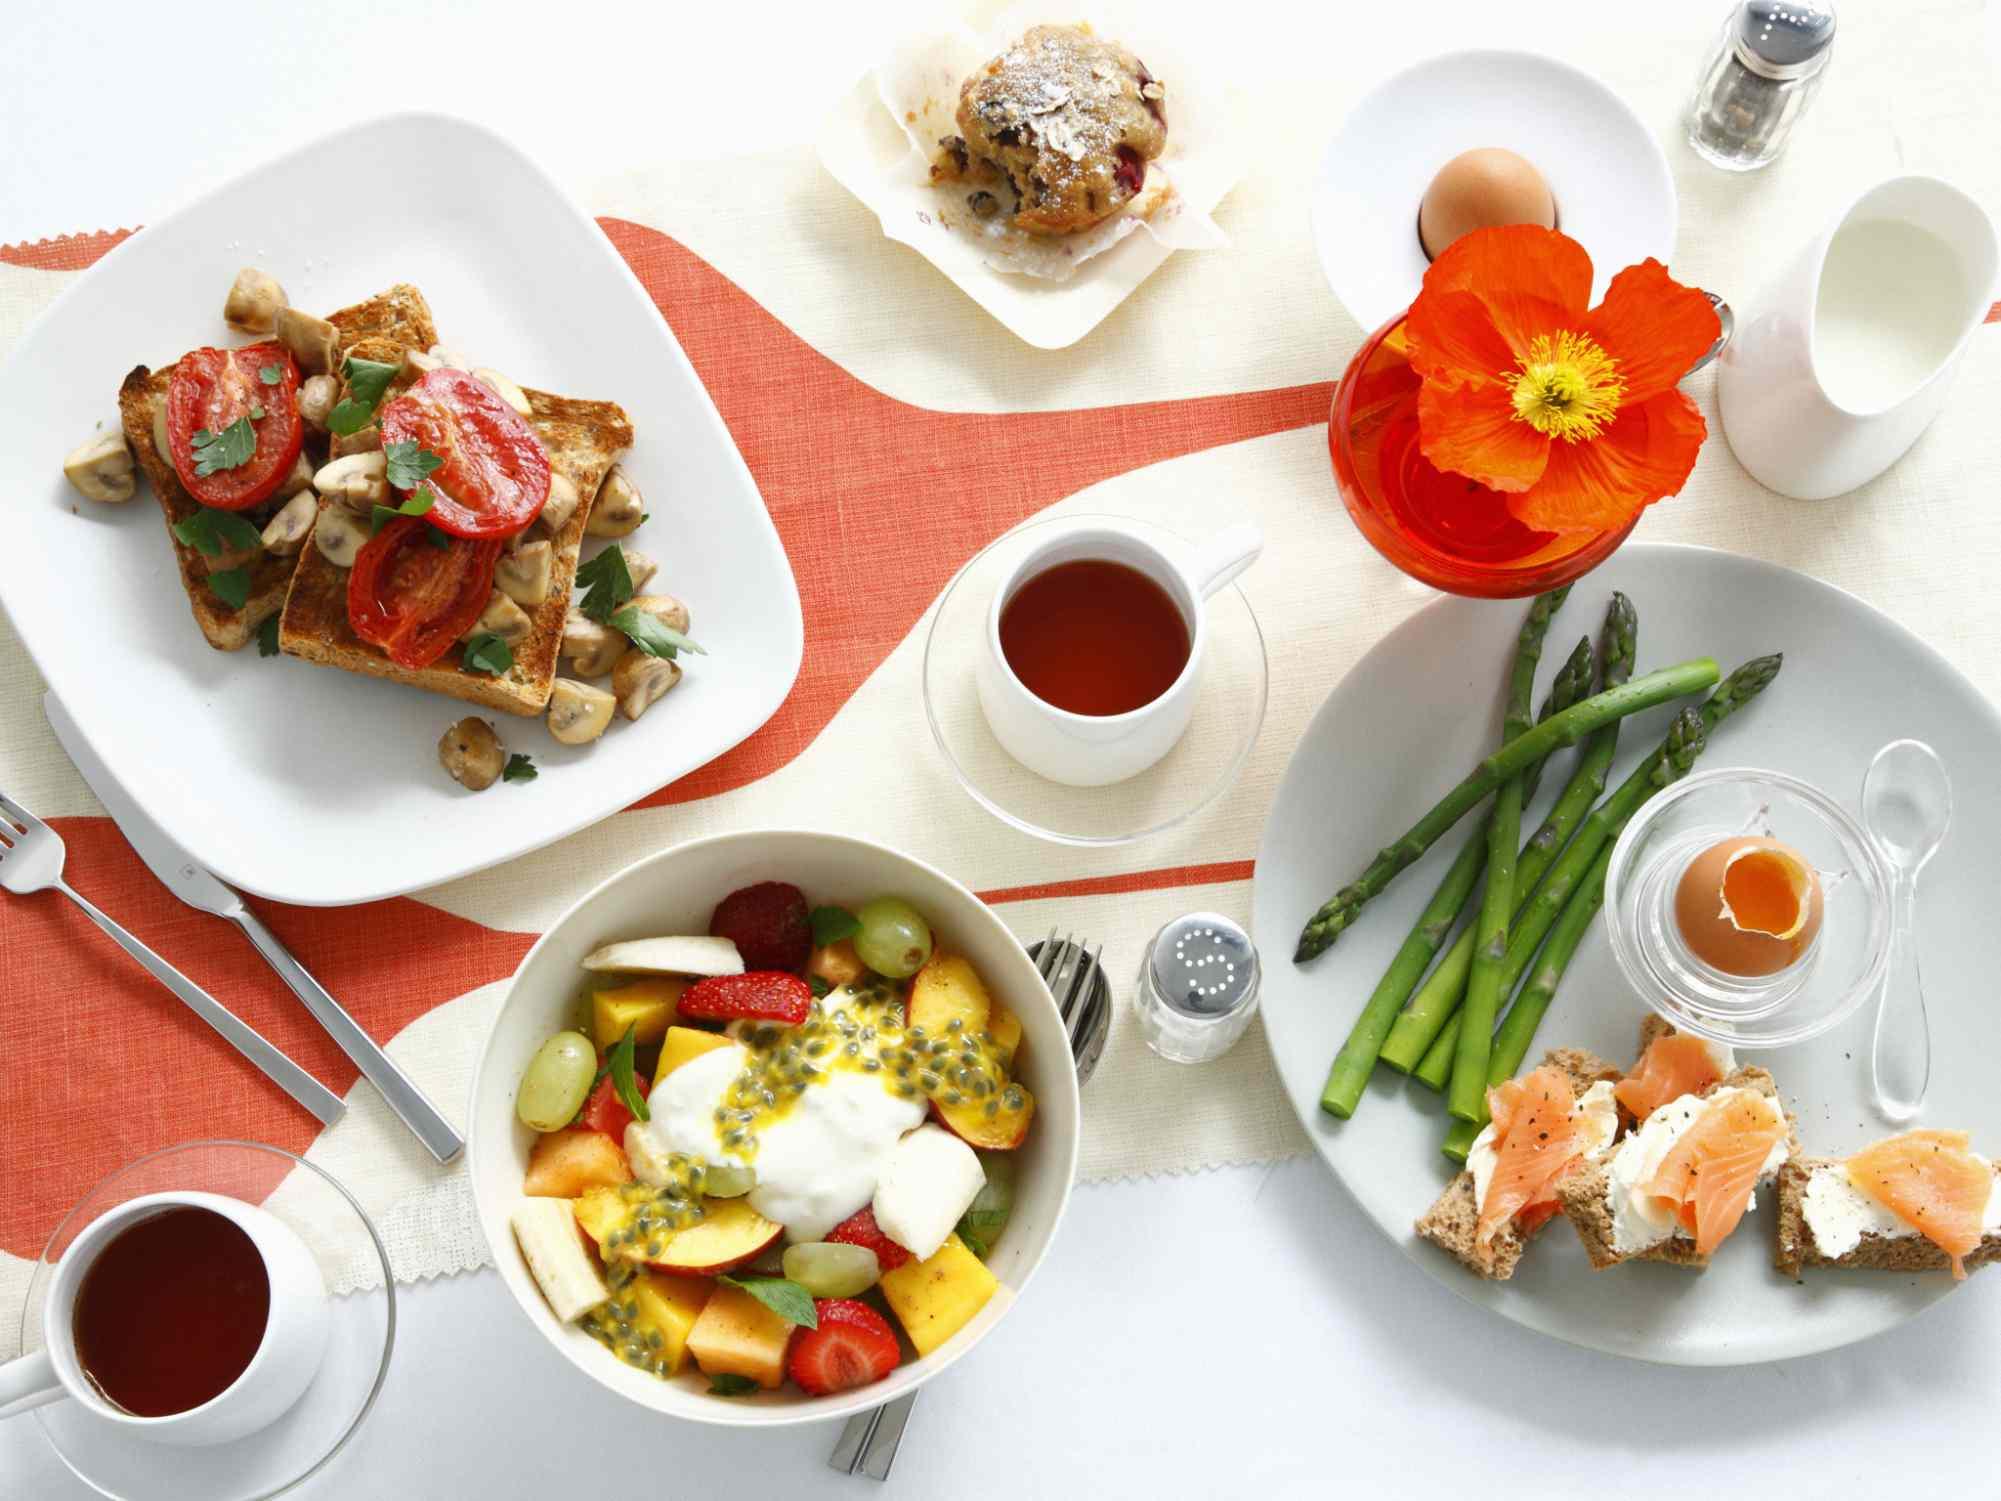 عواقب حذف صبحانه: چاقی و سکته قلبی